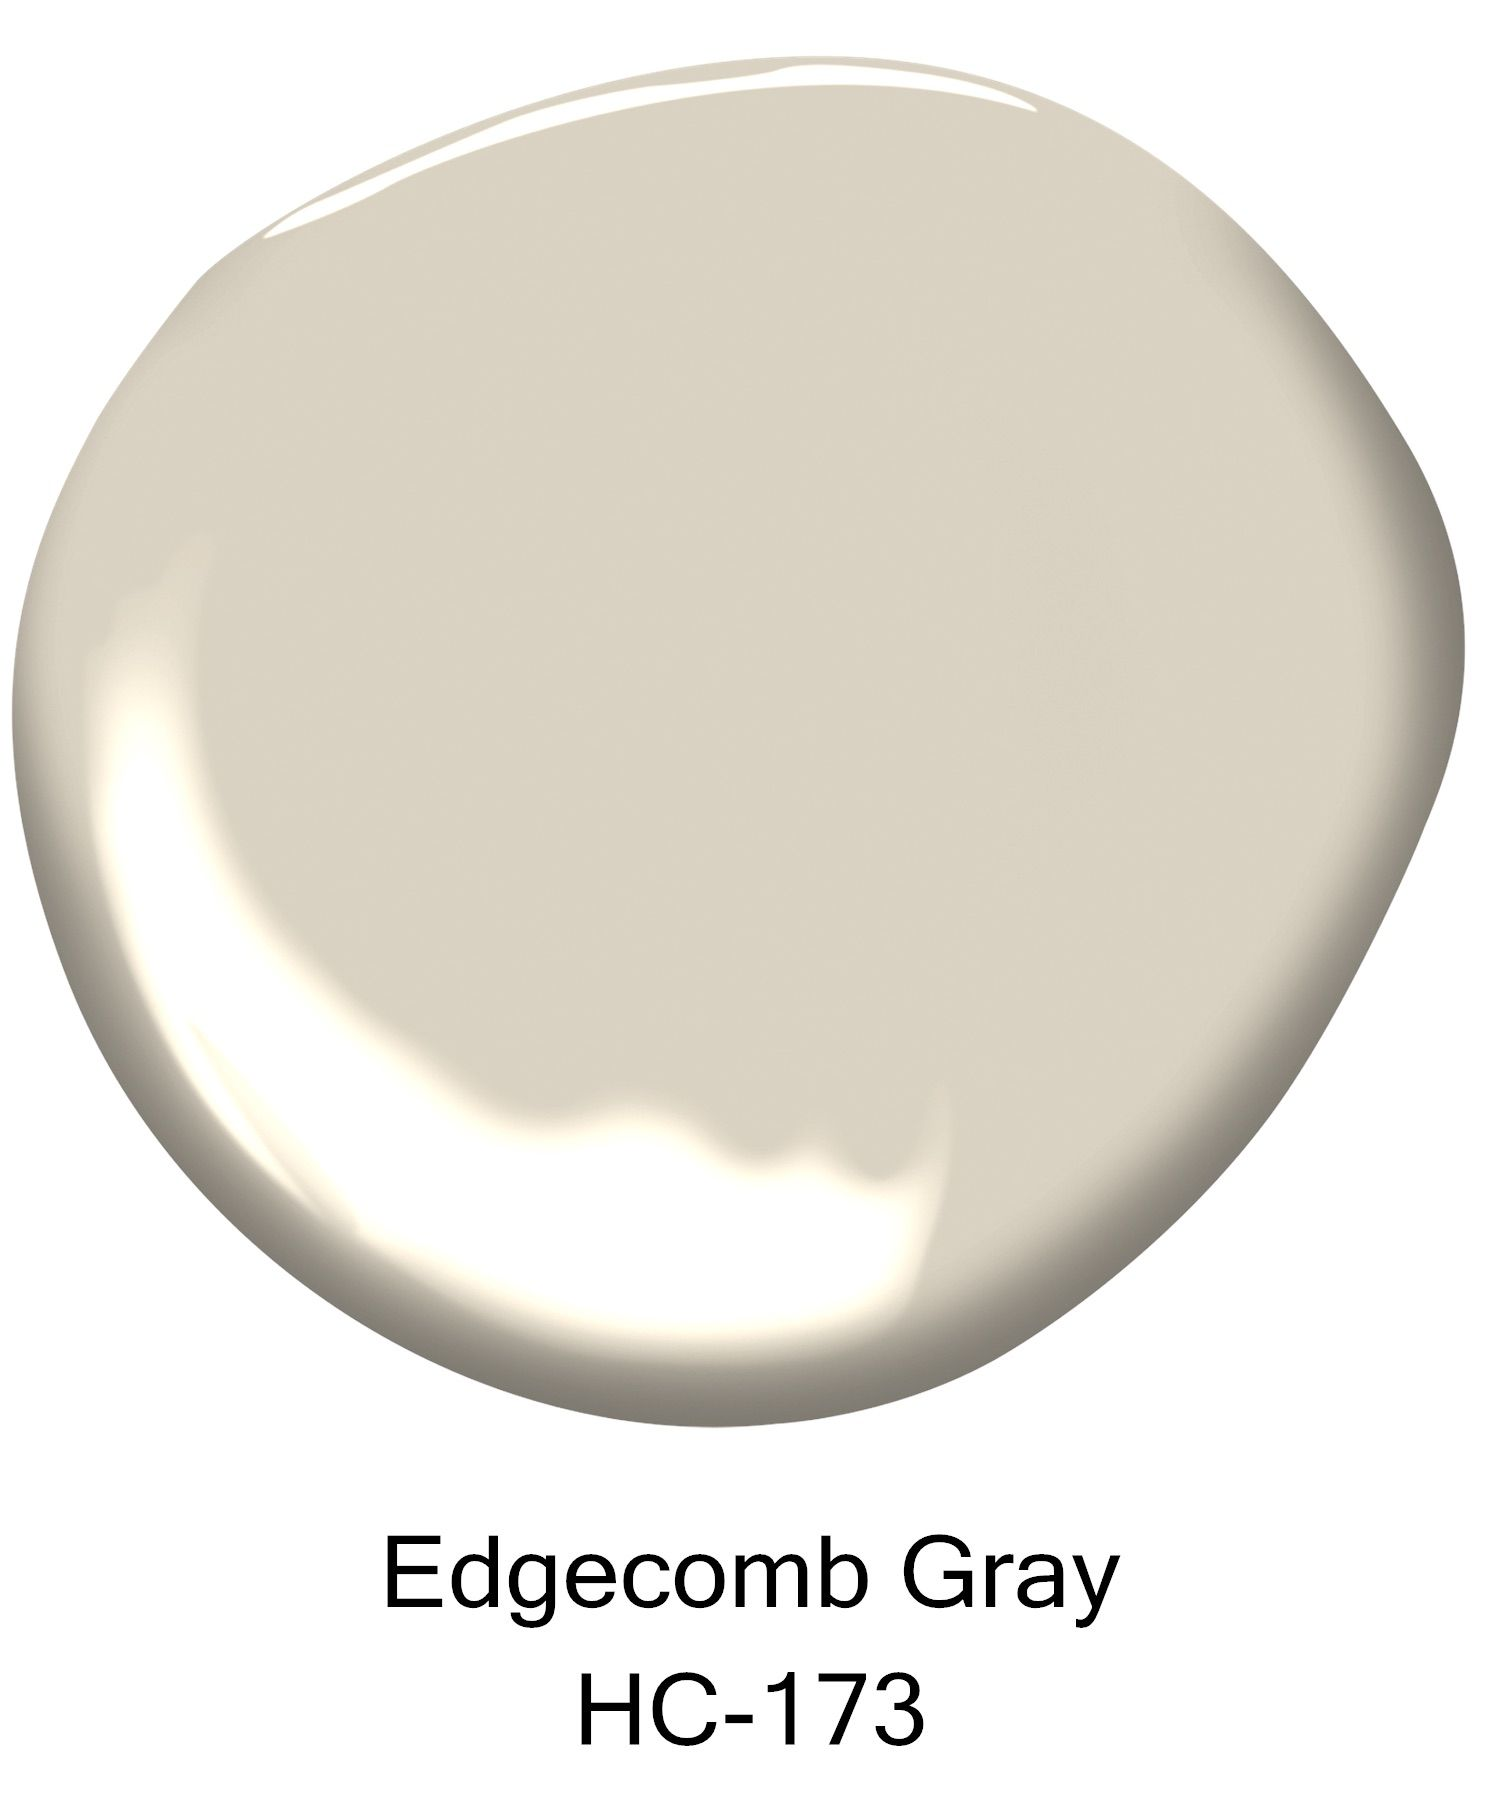 benjamin moore edgecomb gray